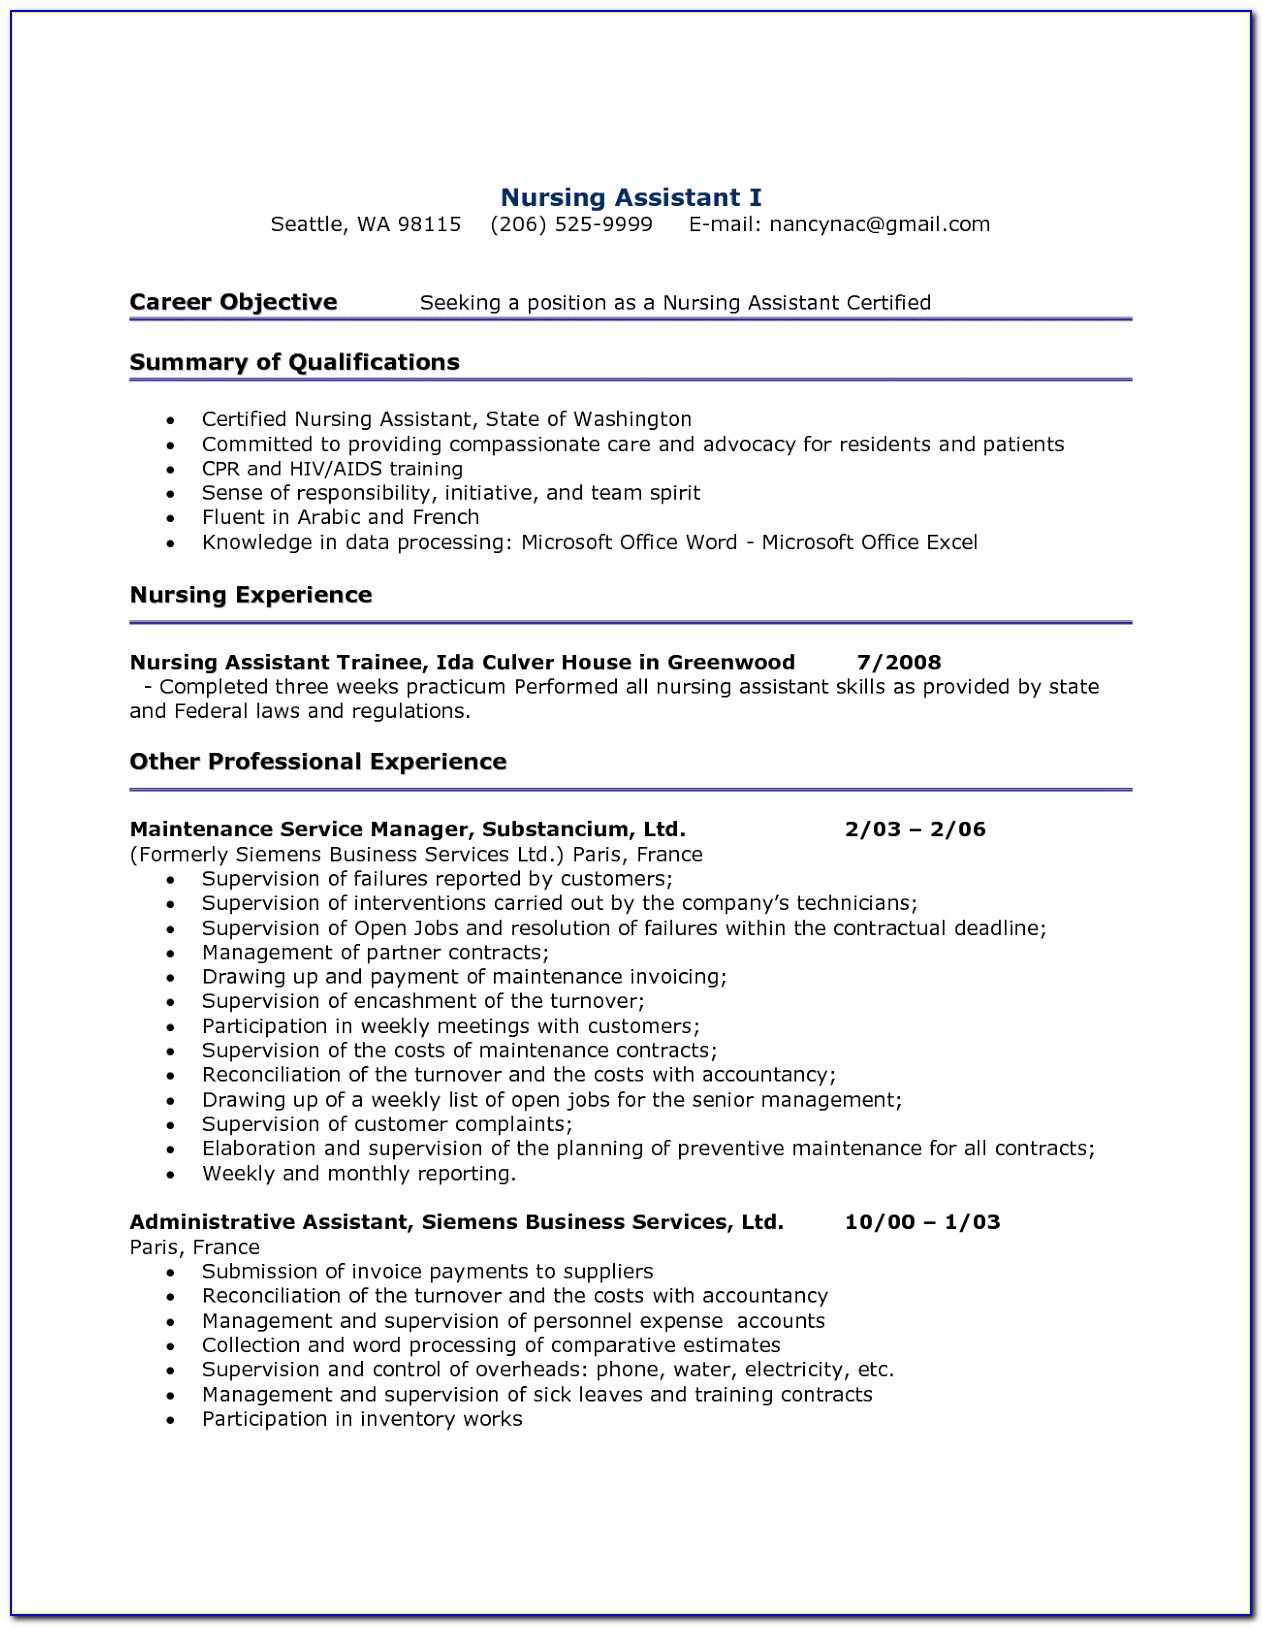 Resume Template For Nurses